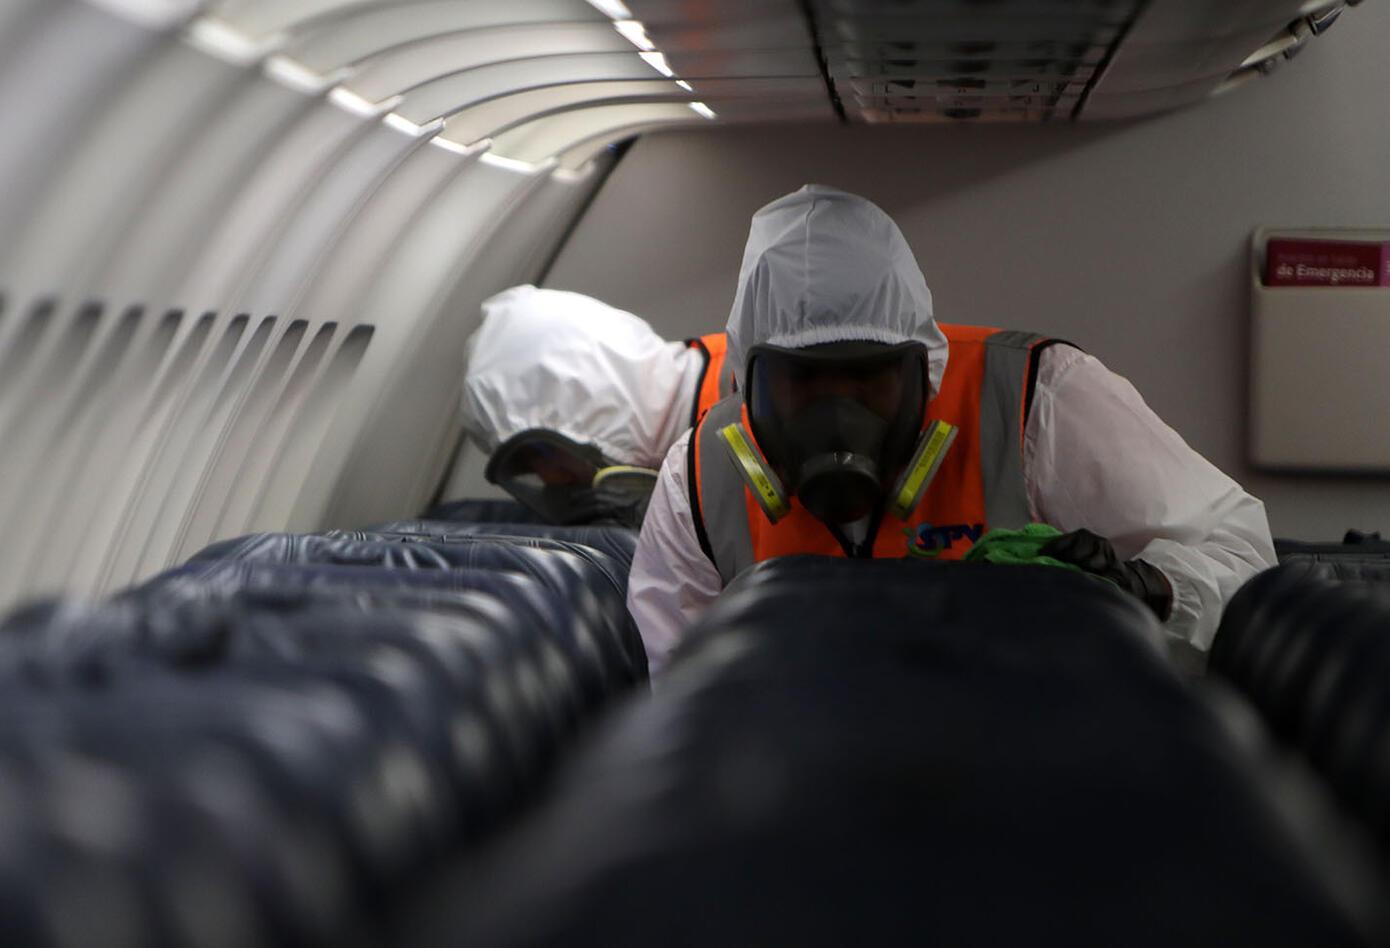 Desinfección de avión de Latam